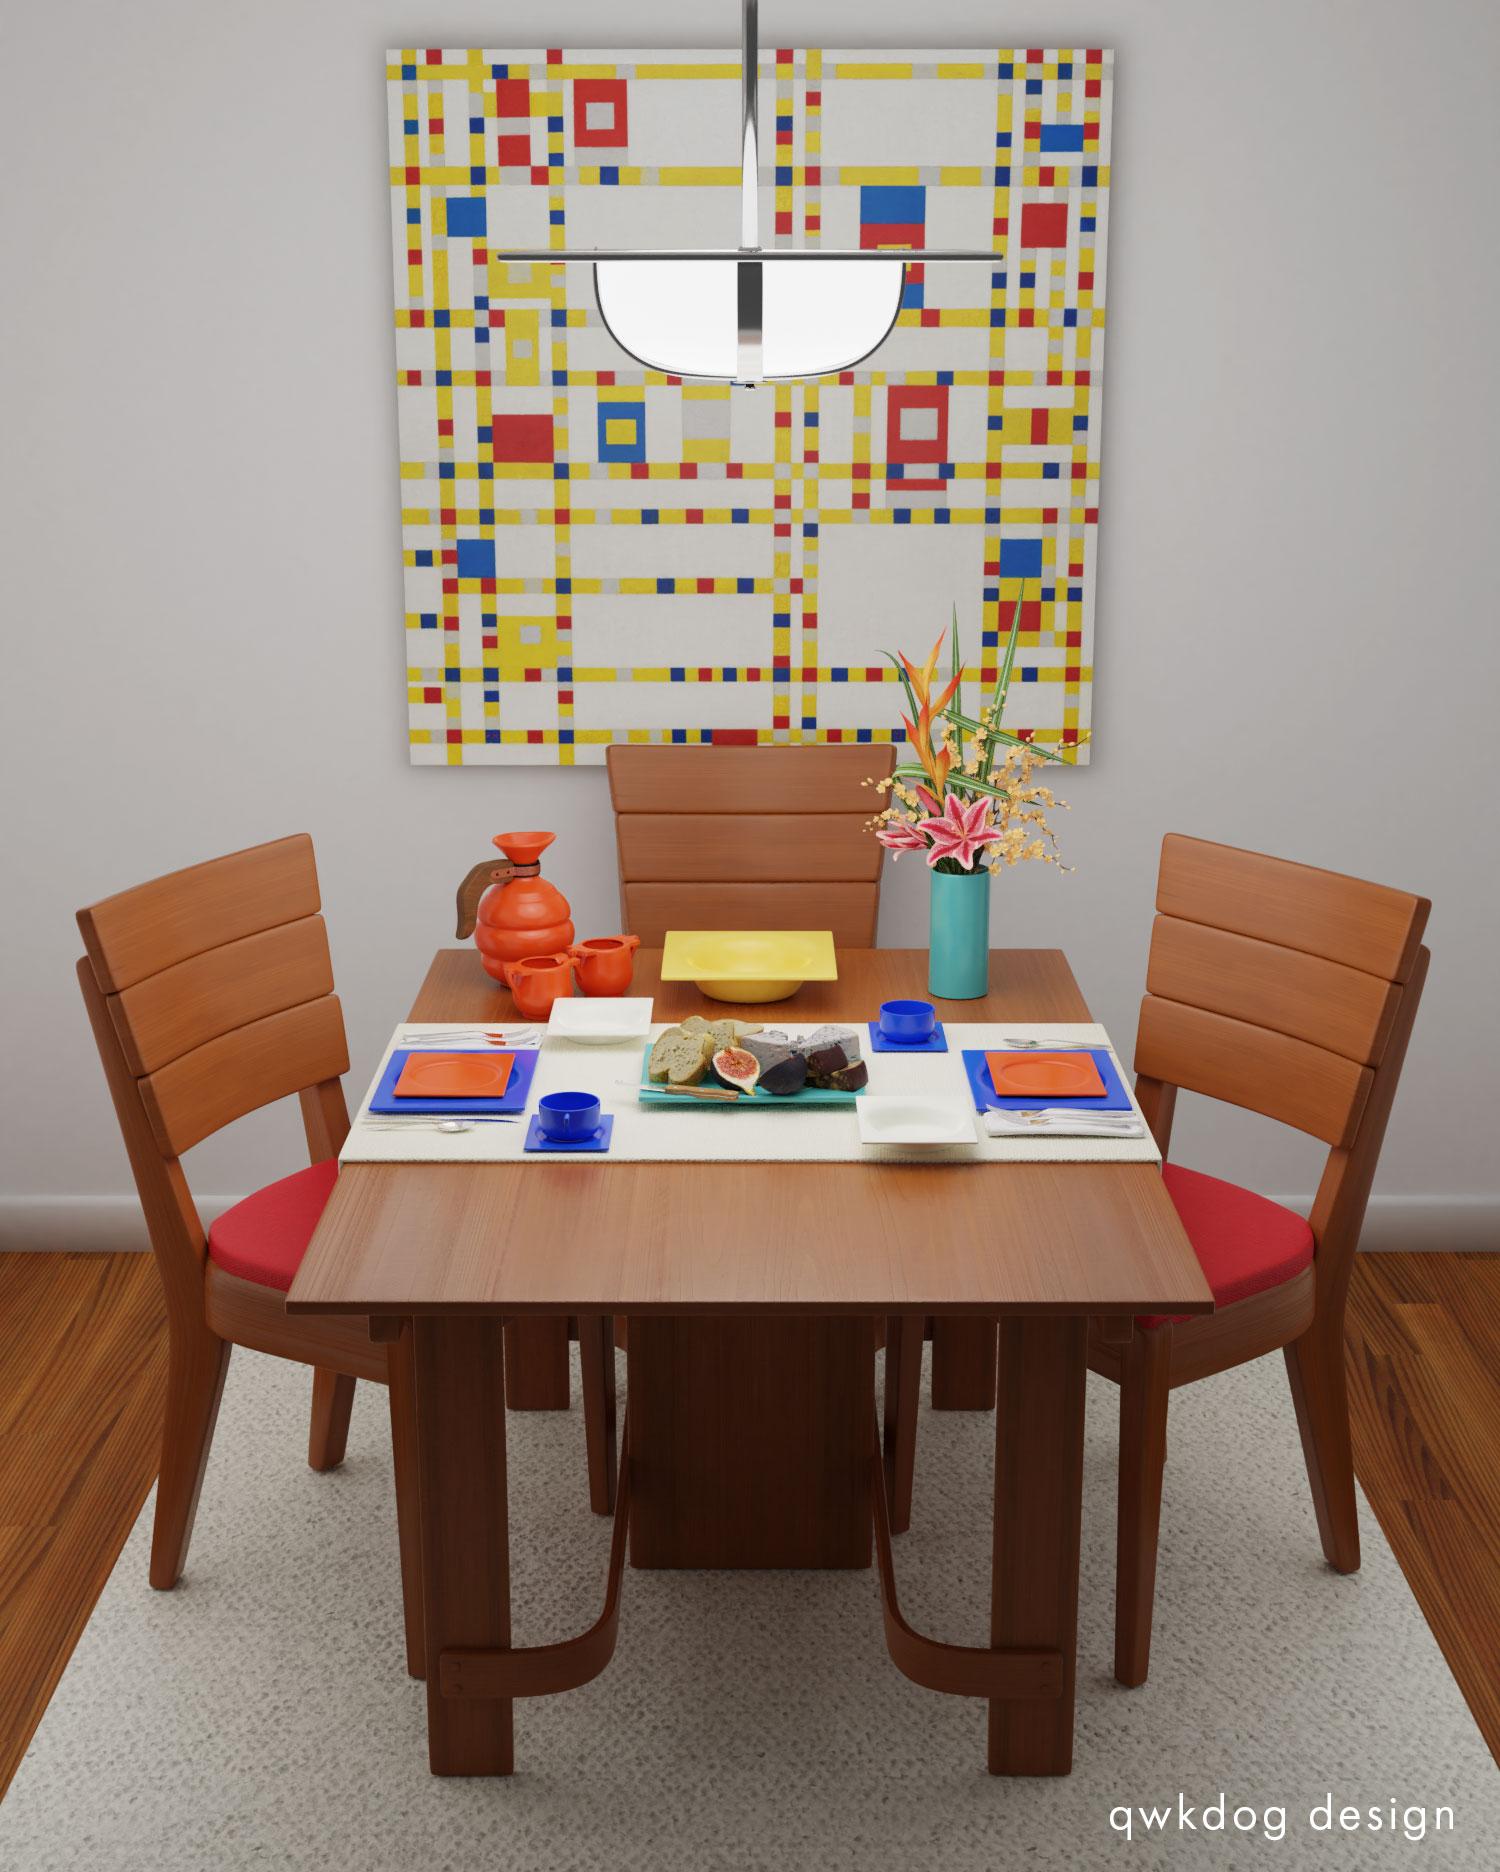 QwkDog 3D Metlox Pintoria Mondrian